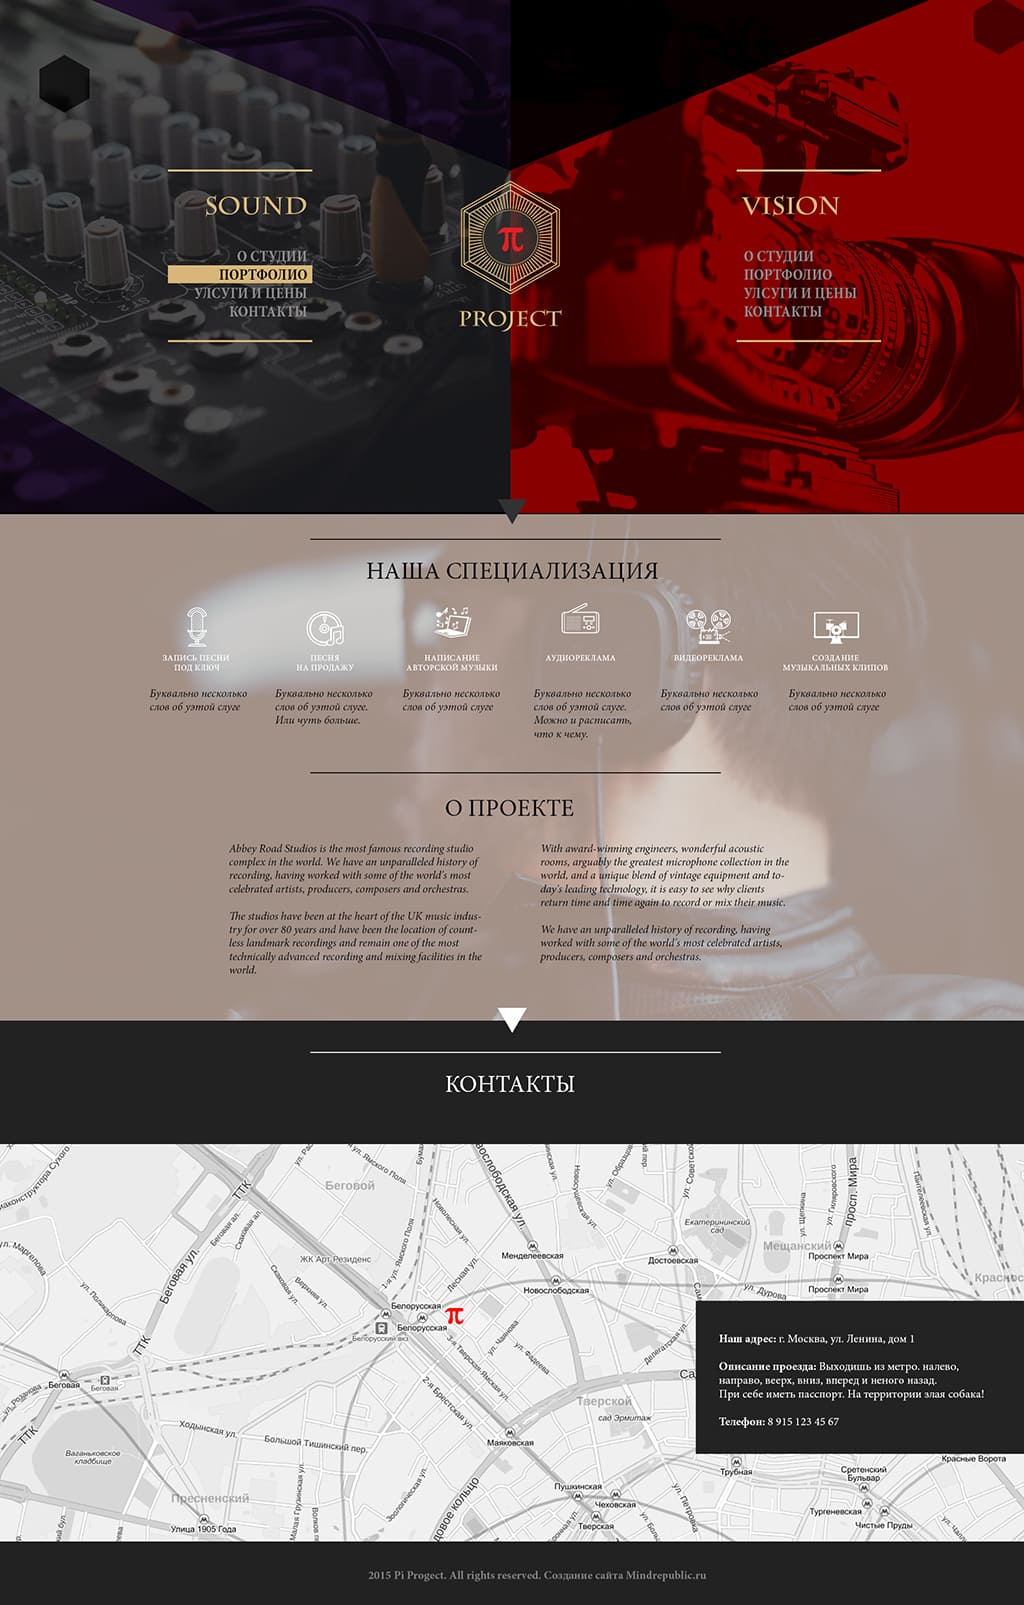 web дизайн сайта студии звукозаписи Piproject